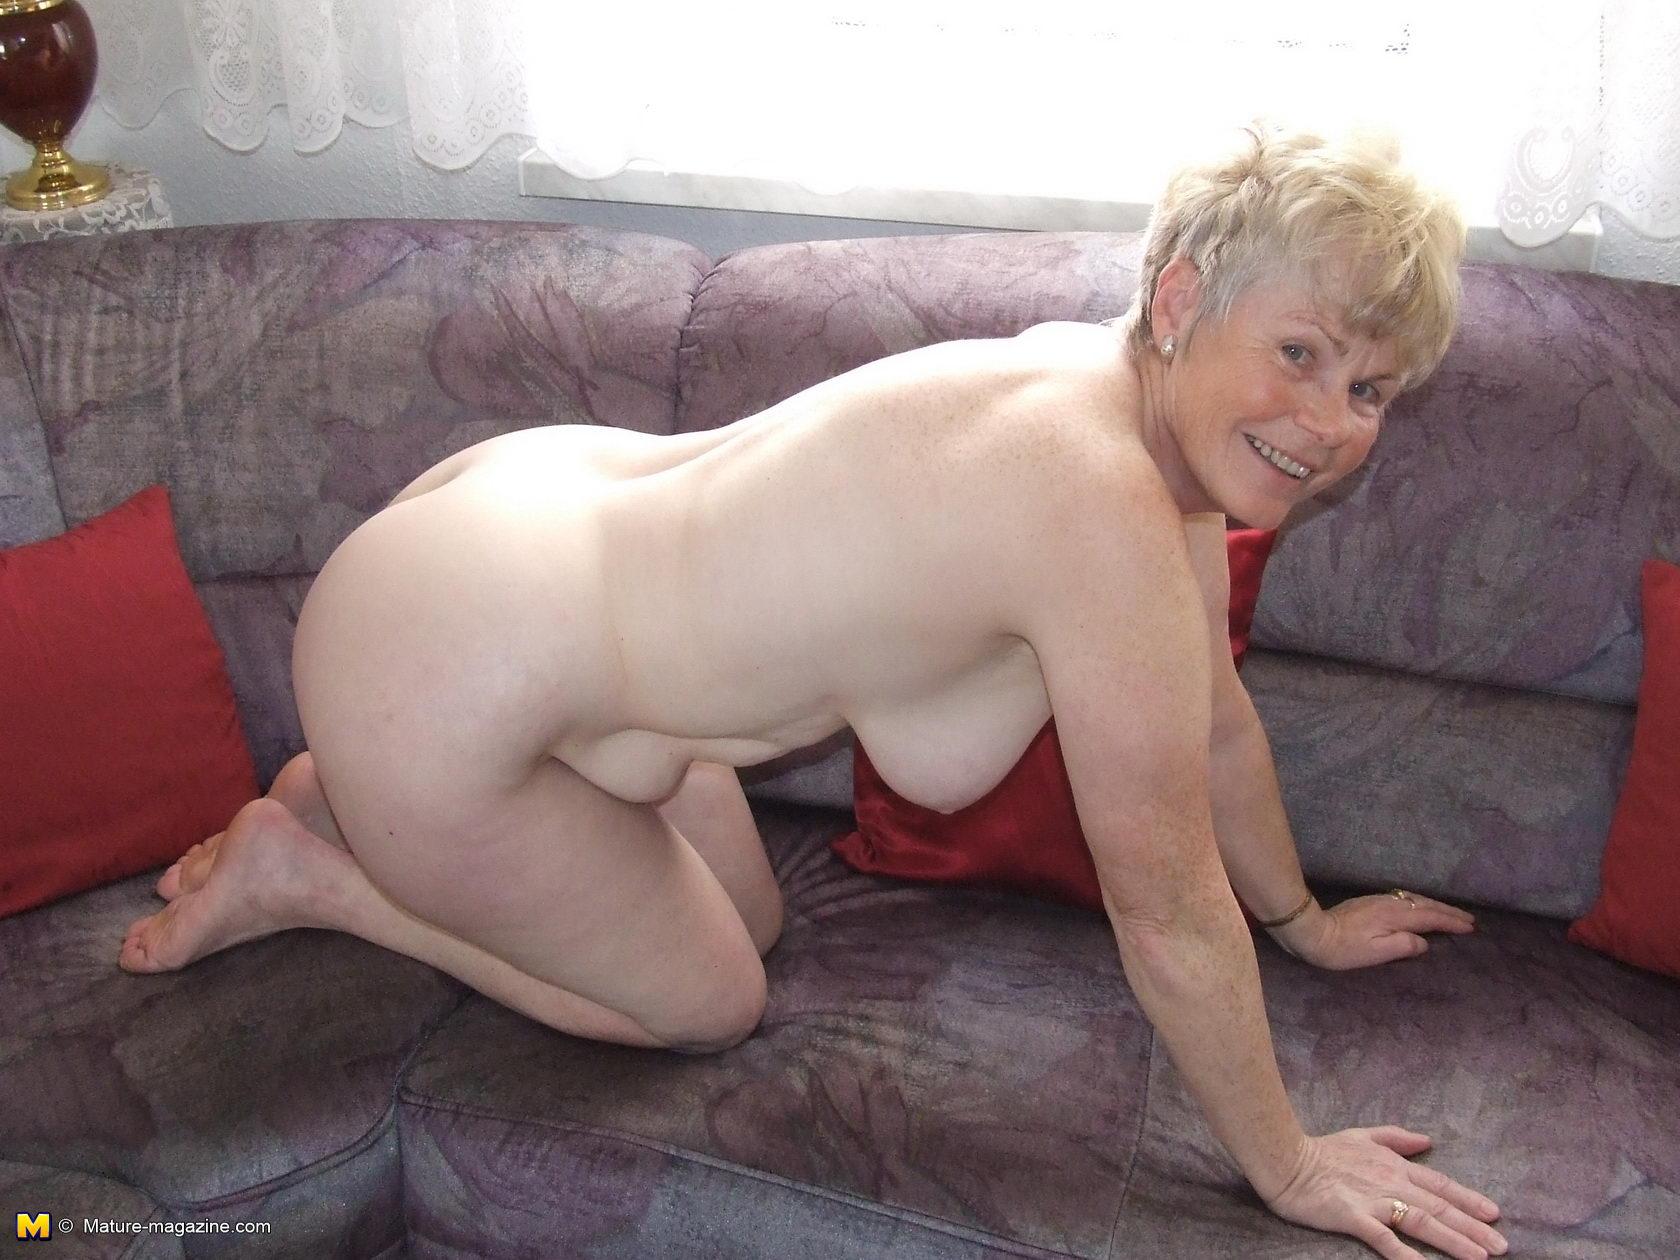 ugly old lady naked